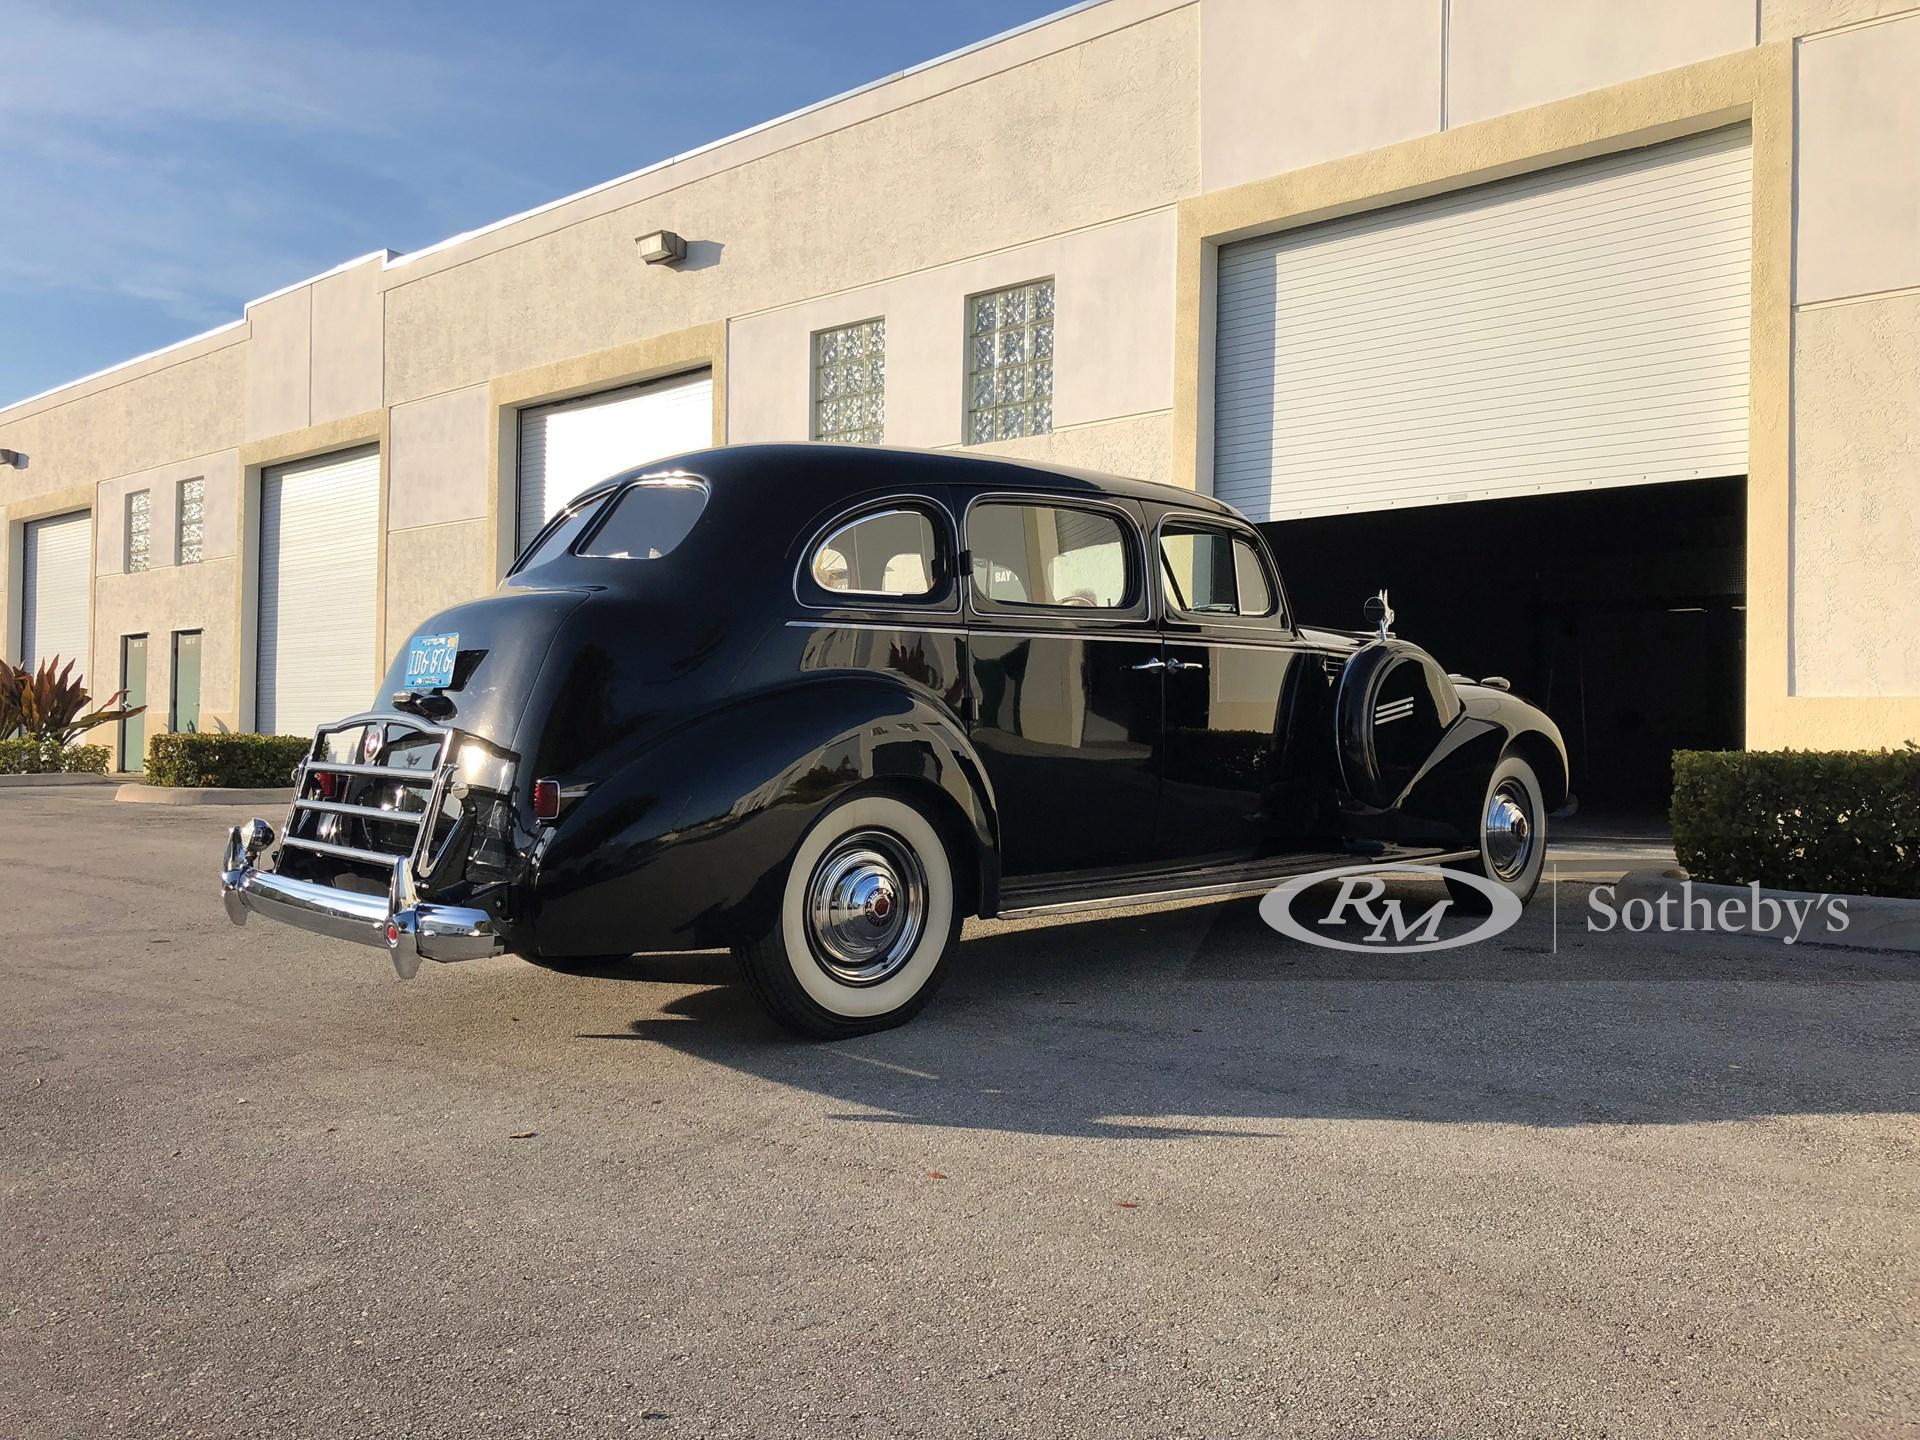 1940 Packard Super 8 One-Eighty Touring Sedan